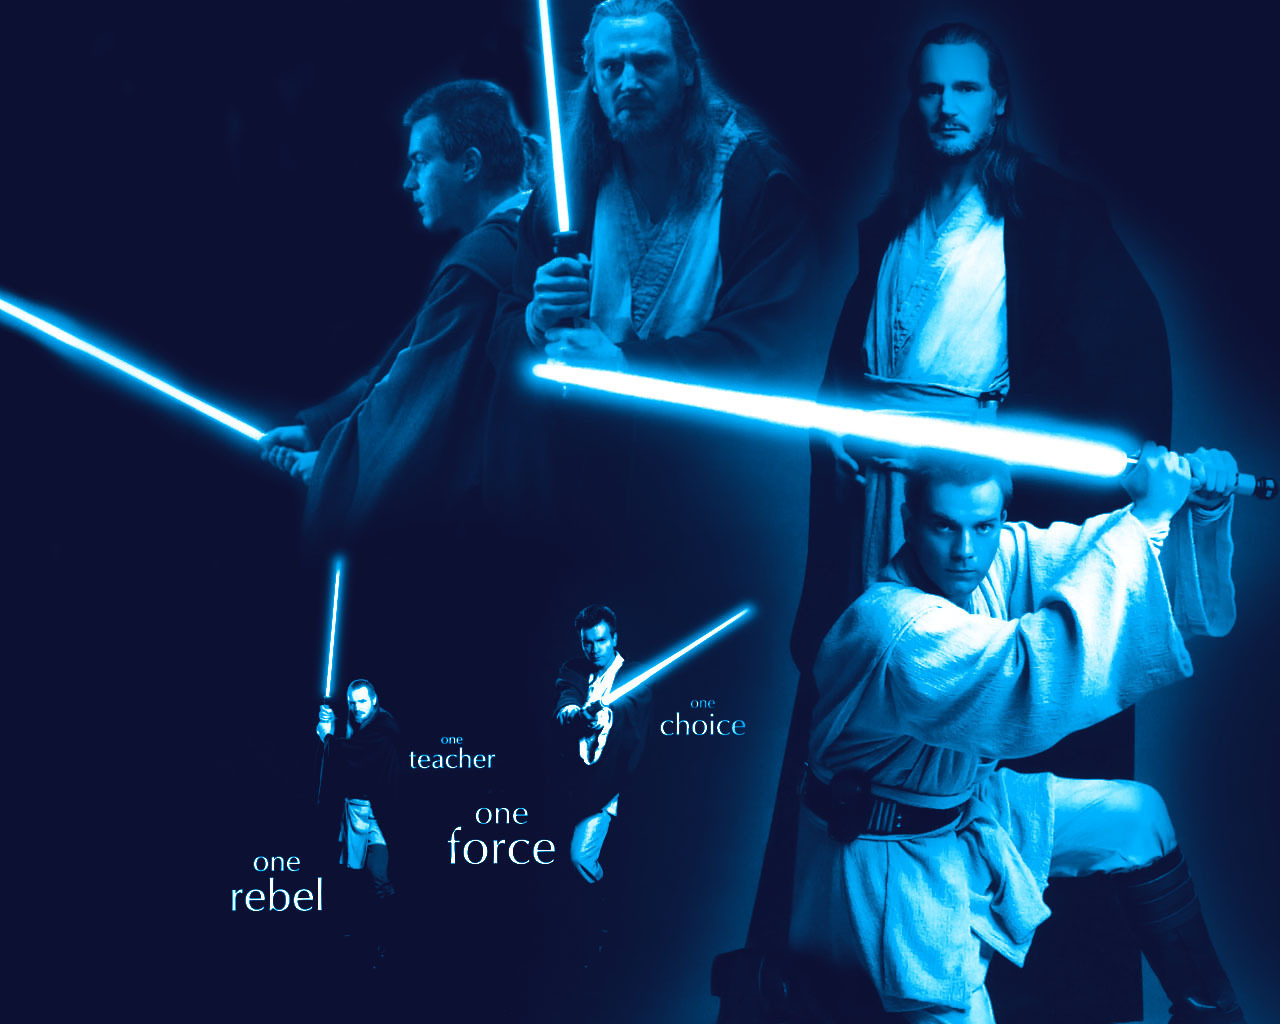 Obi Wan Kenobi images Obi Wan Kenobi Wallpaper wallpaper photos 1280x1024